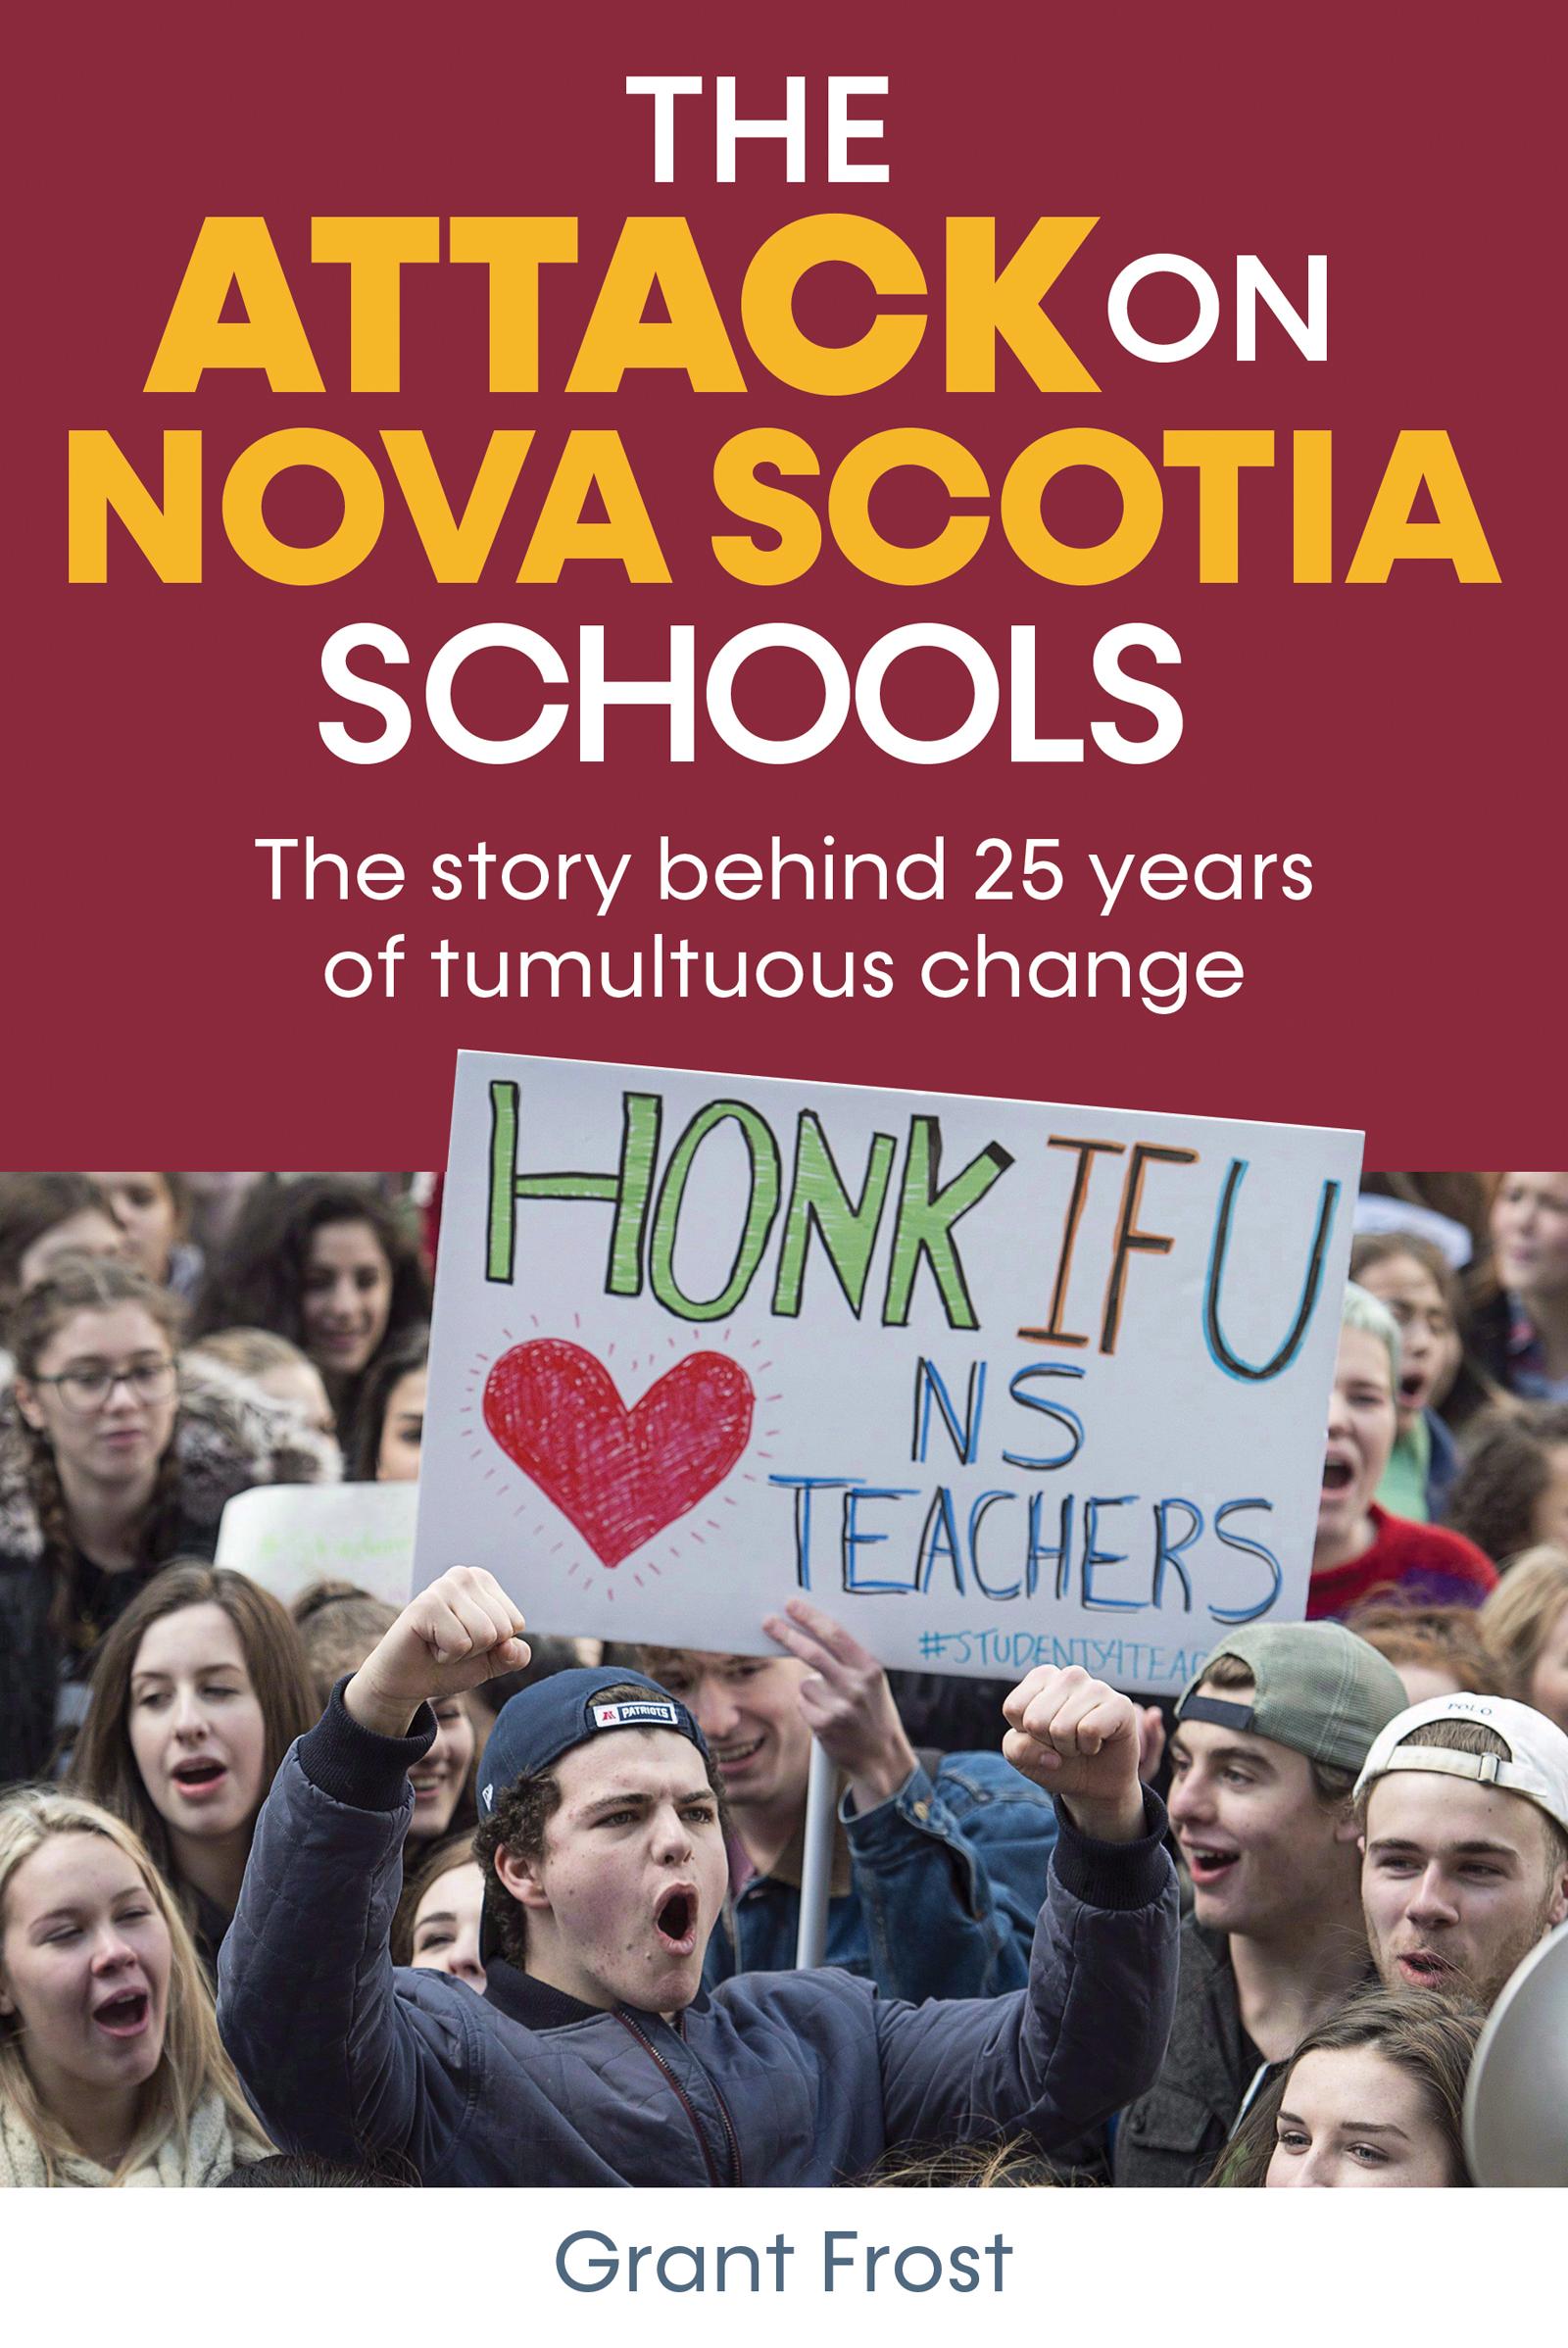 The Attack on Nova Scotia Schools